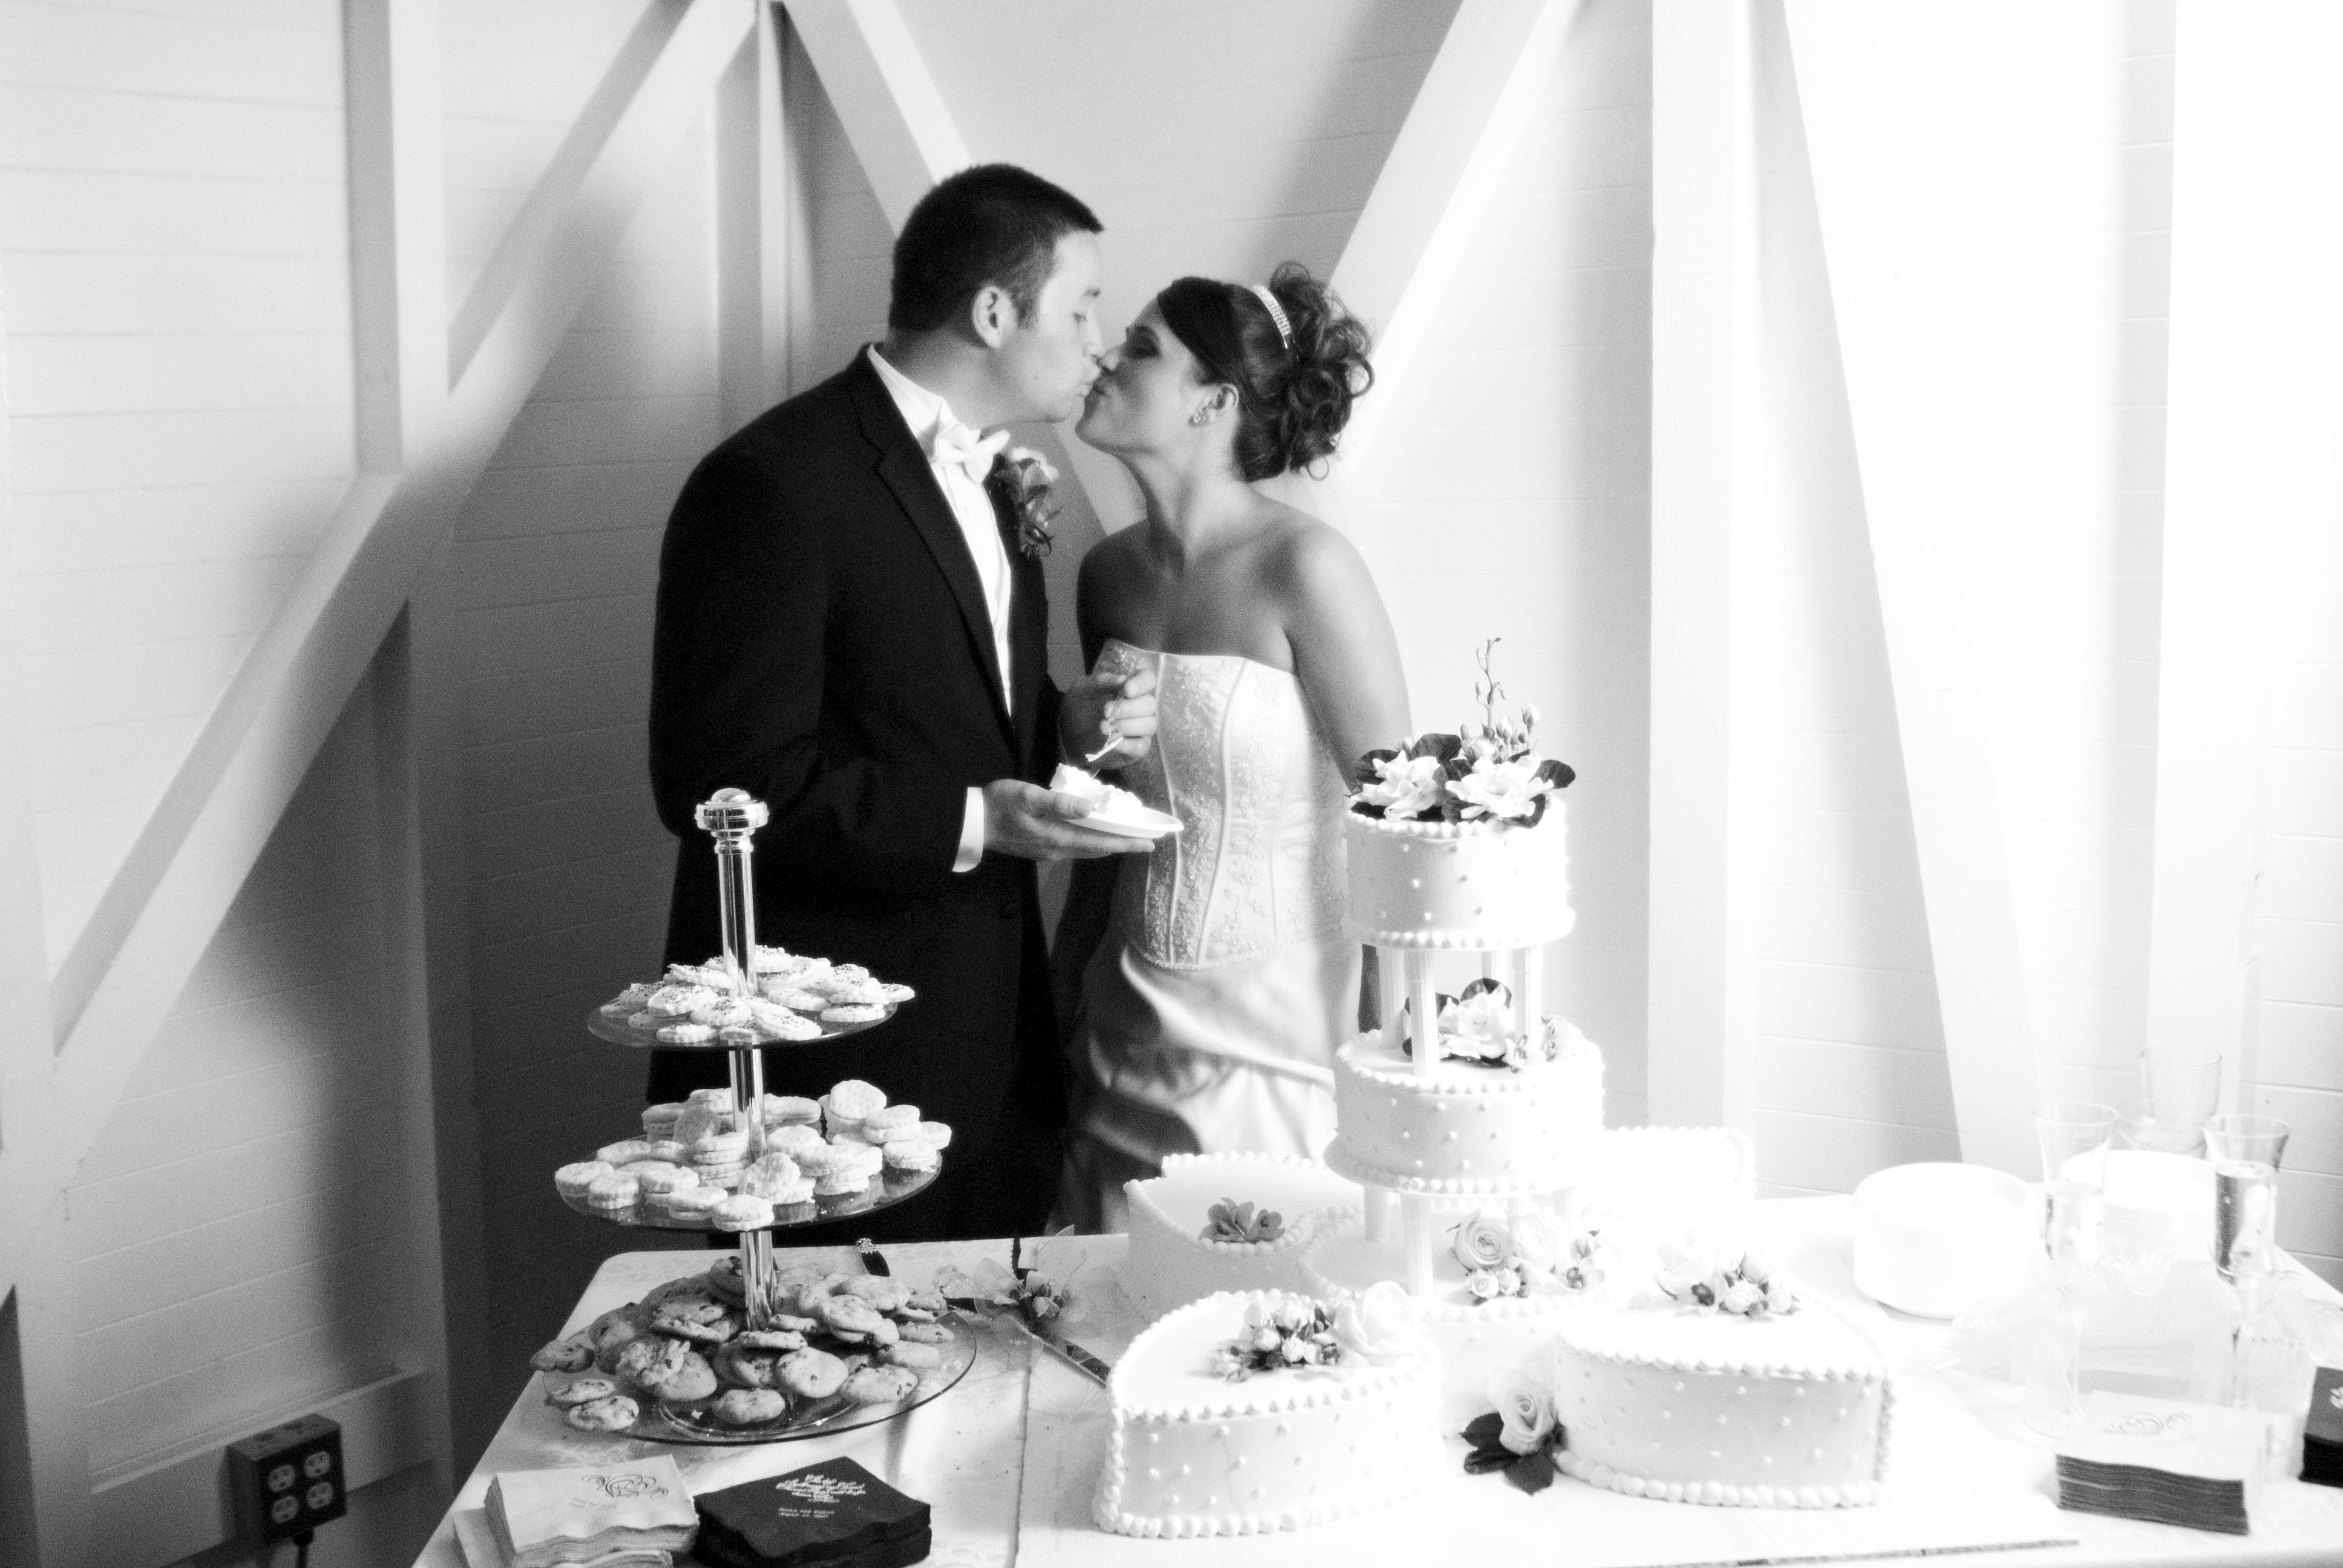 Reception, Flowers & Decor, Cakes, Destinations, cake, Cruise, Cake cutting, Boat, Ship, Virginia v steamship